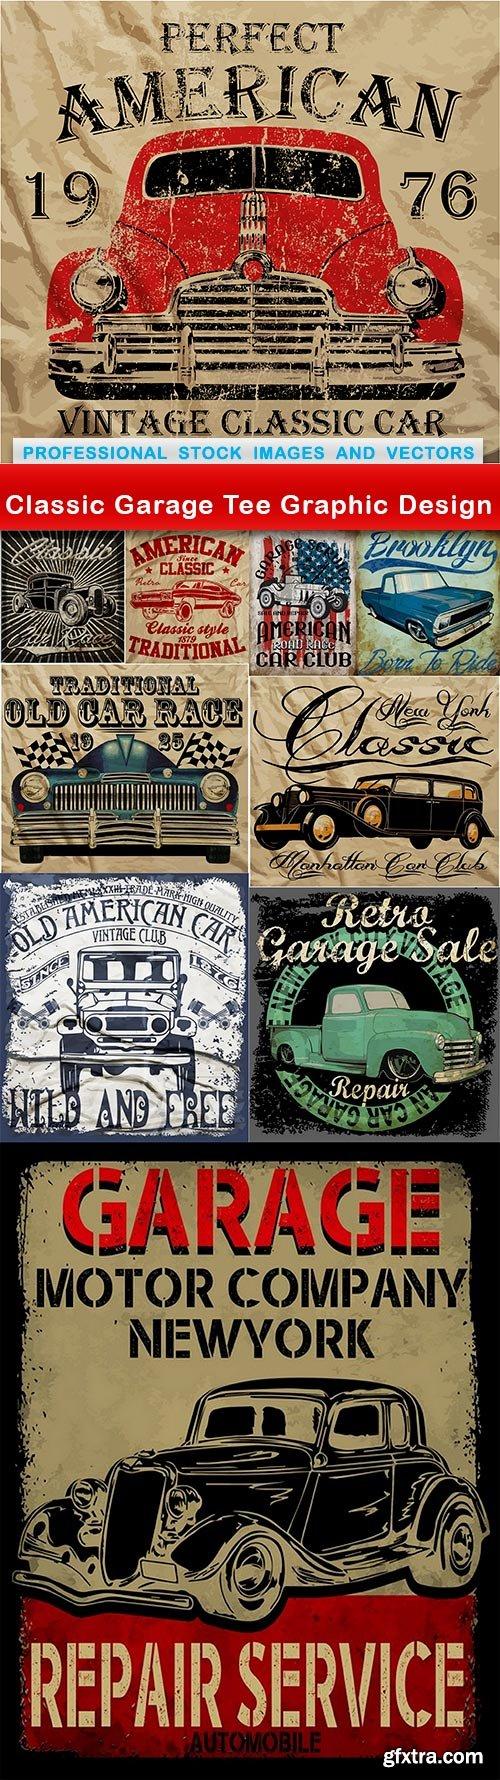 Classic Garage Tee Graphic Design - 10 EPS